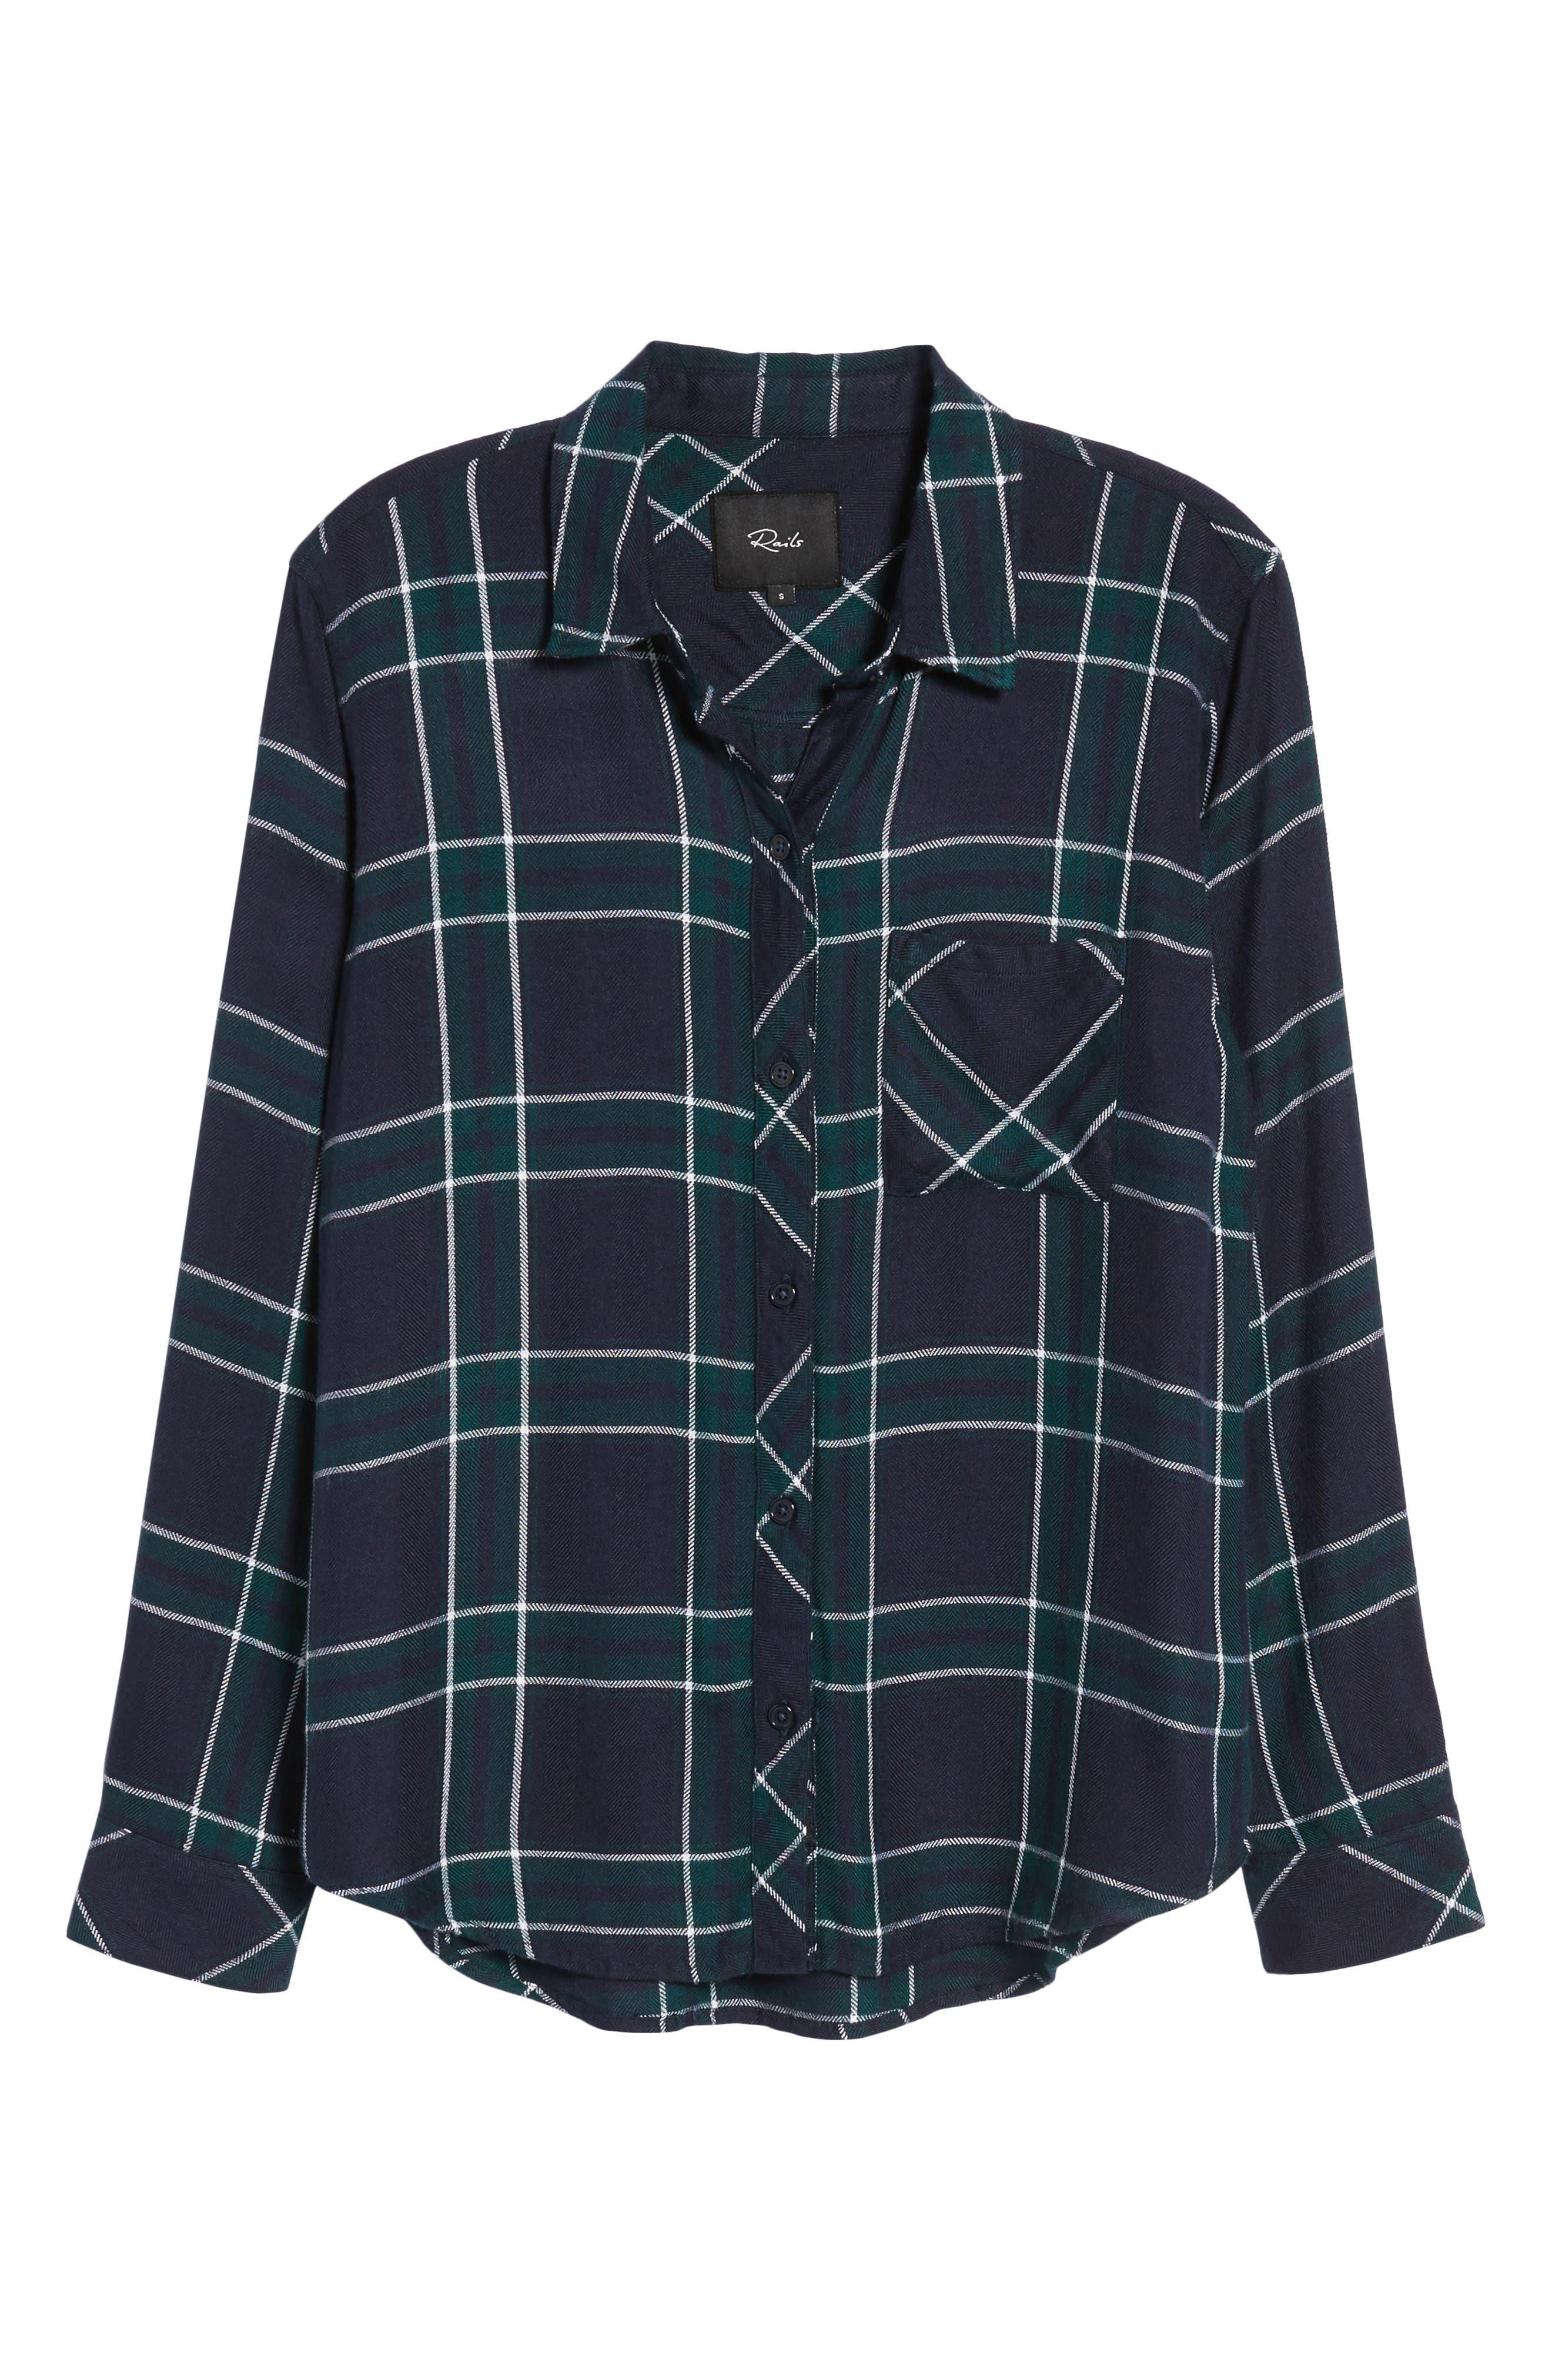 Hunter Plaid Shirt,                             Alternate thumbnail 7, color,                             MIDNIGHT FOREST WHITE